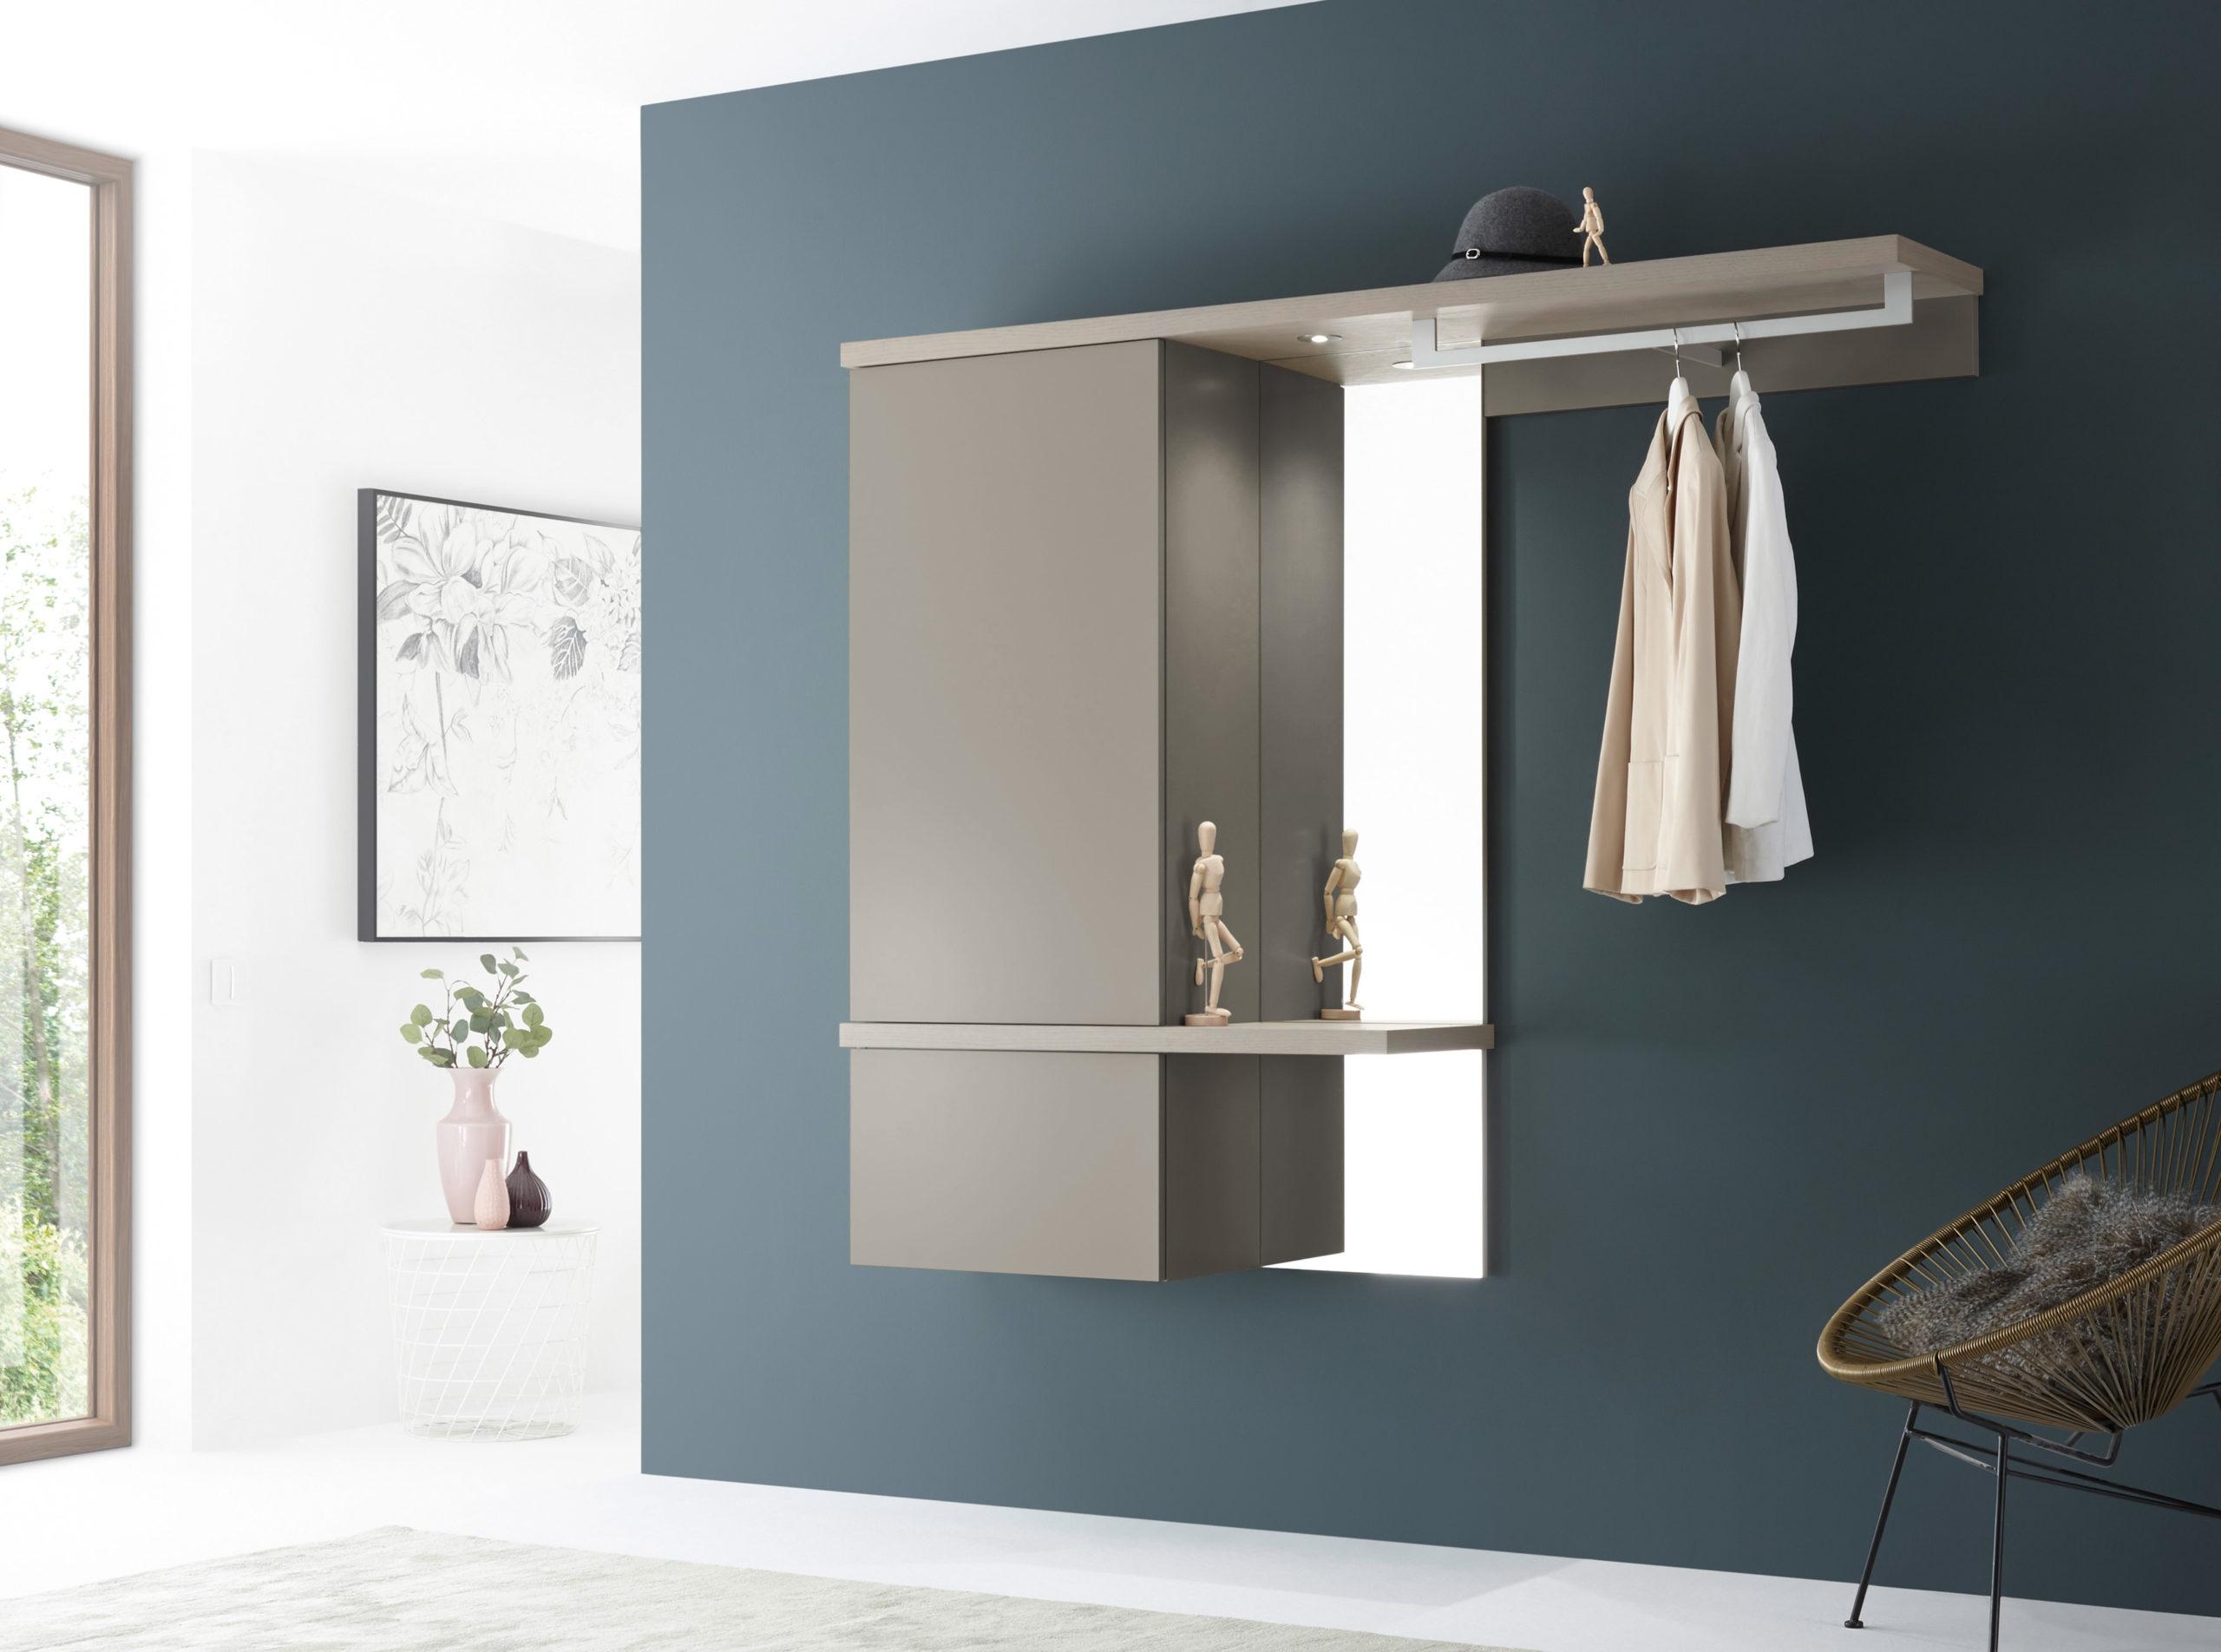 Sudbrock TANDO Garderobe No. 39 mit Holz-Akzent in 129-Eiche-Sahara, Lack muschelgrau #405